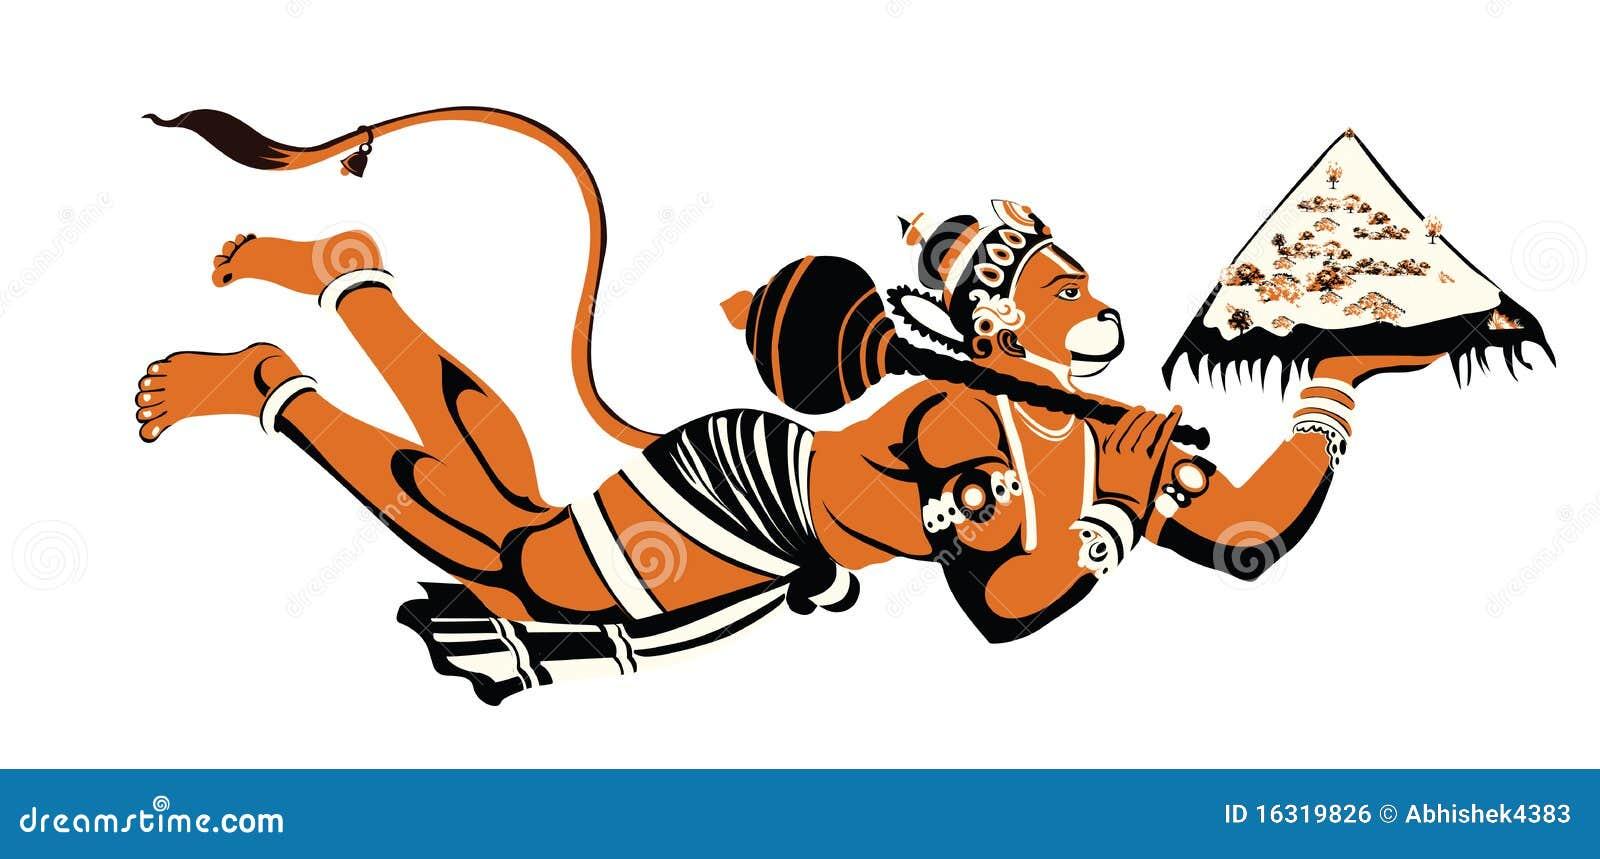 Lord Hanuman Royalty Free Stock Image - Image: 16319826